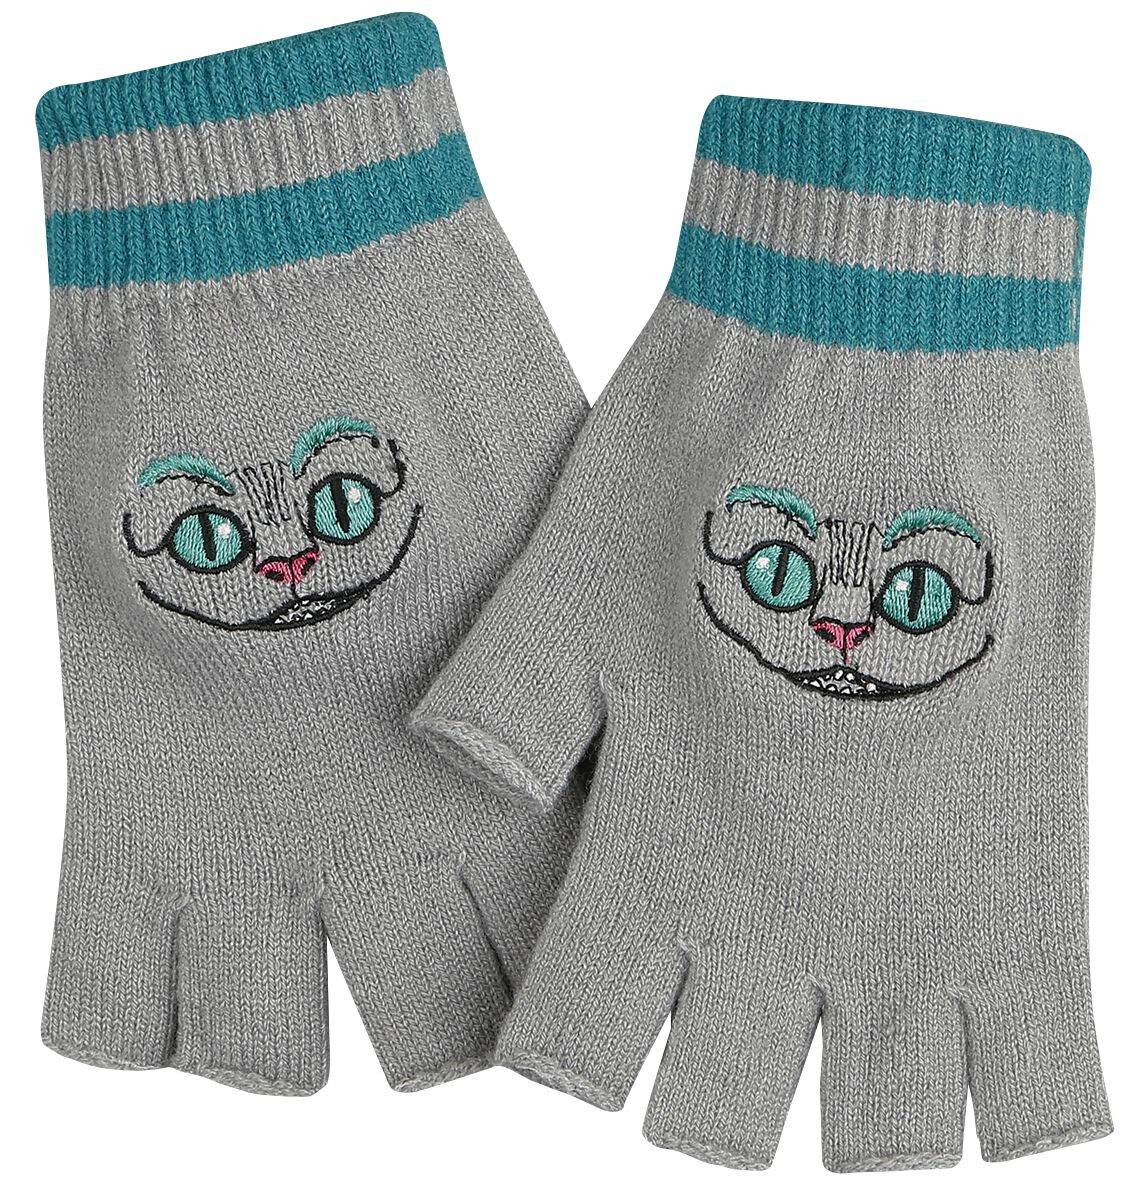 Image of   Alice i Eventyrland Filurkatten Fingerløse handsker grå-blå